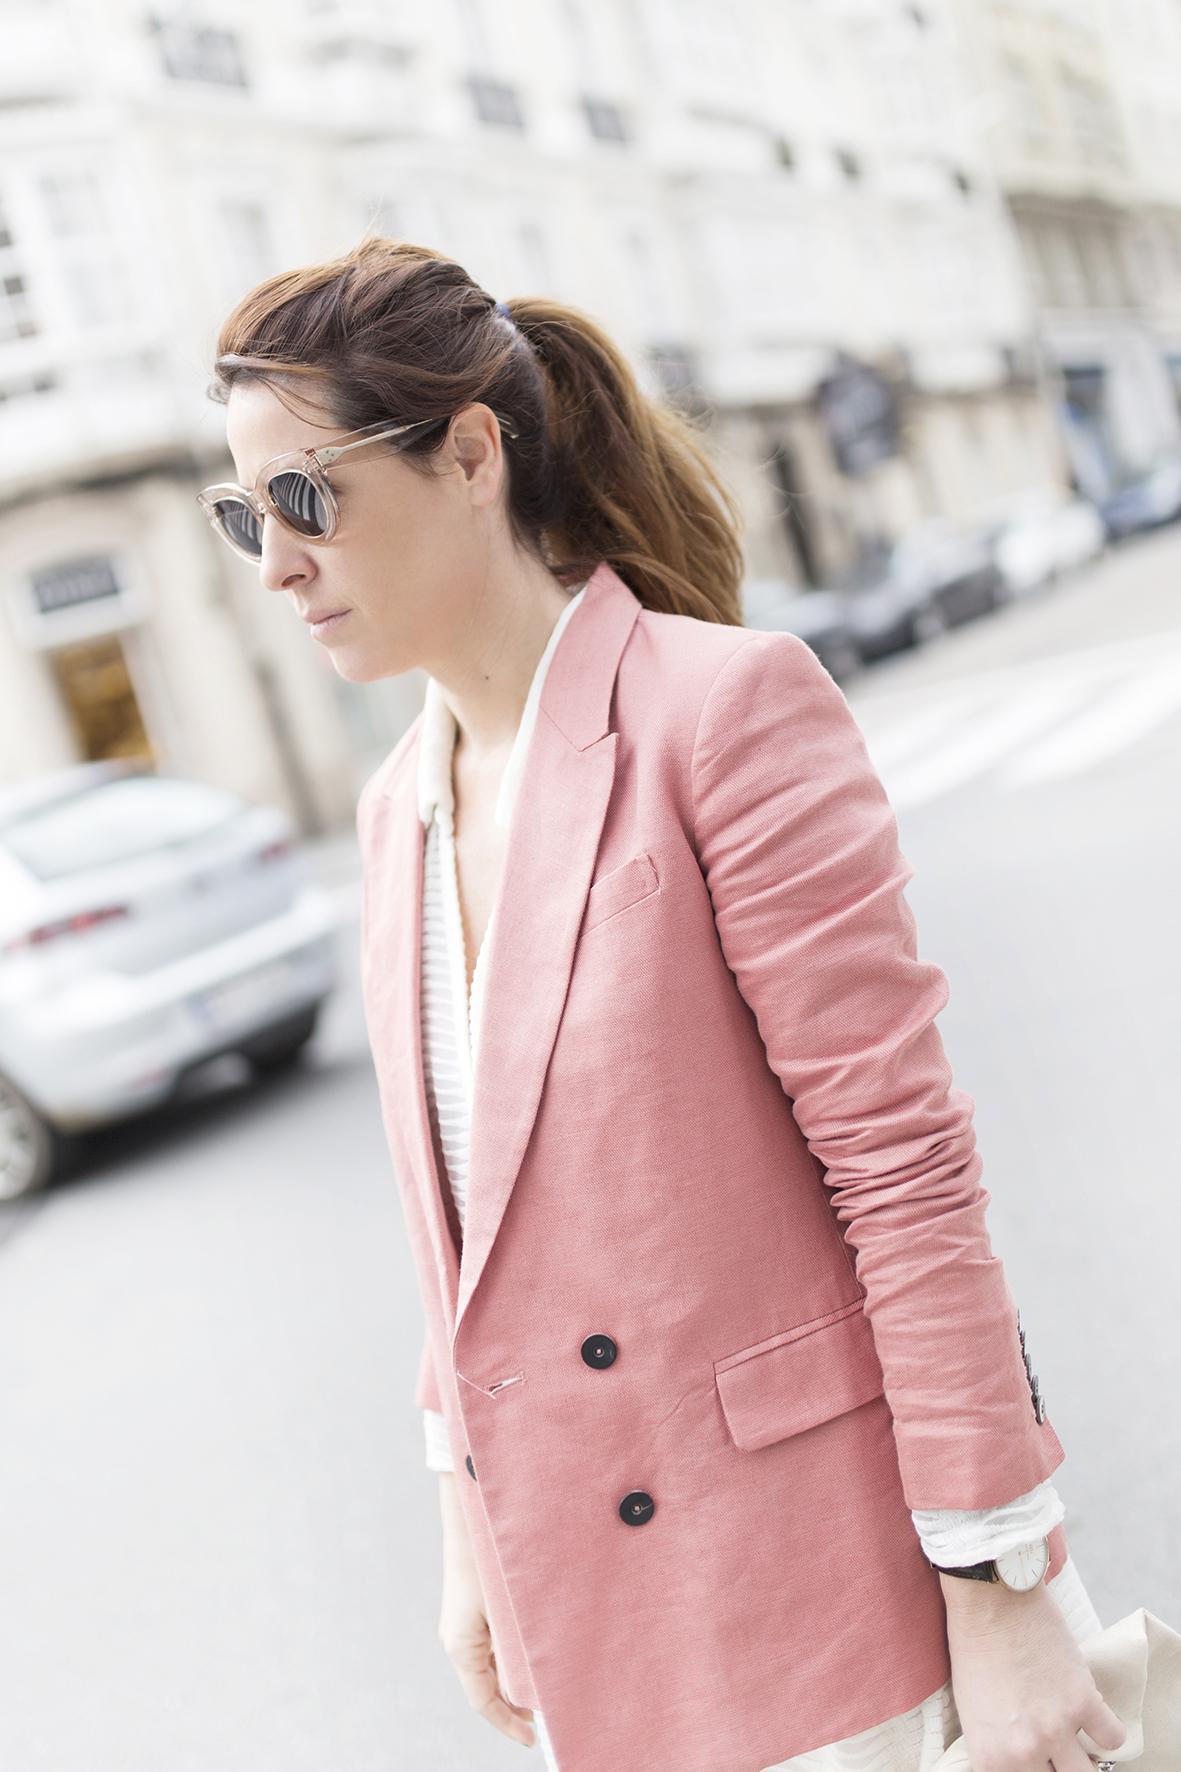 Mango blazer -cèline sunglasses-fashion- Coruña-Voglia-streetstye-descalzaporelparque-Silver Lake Zubi